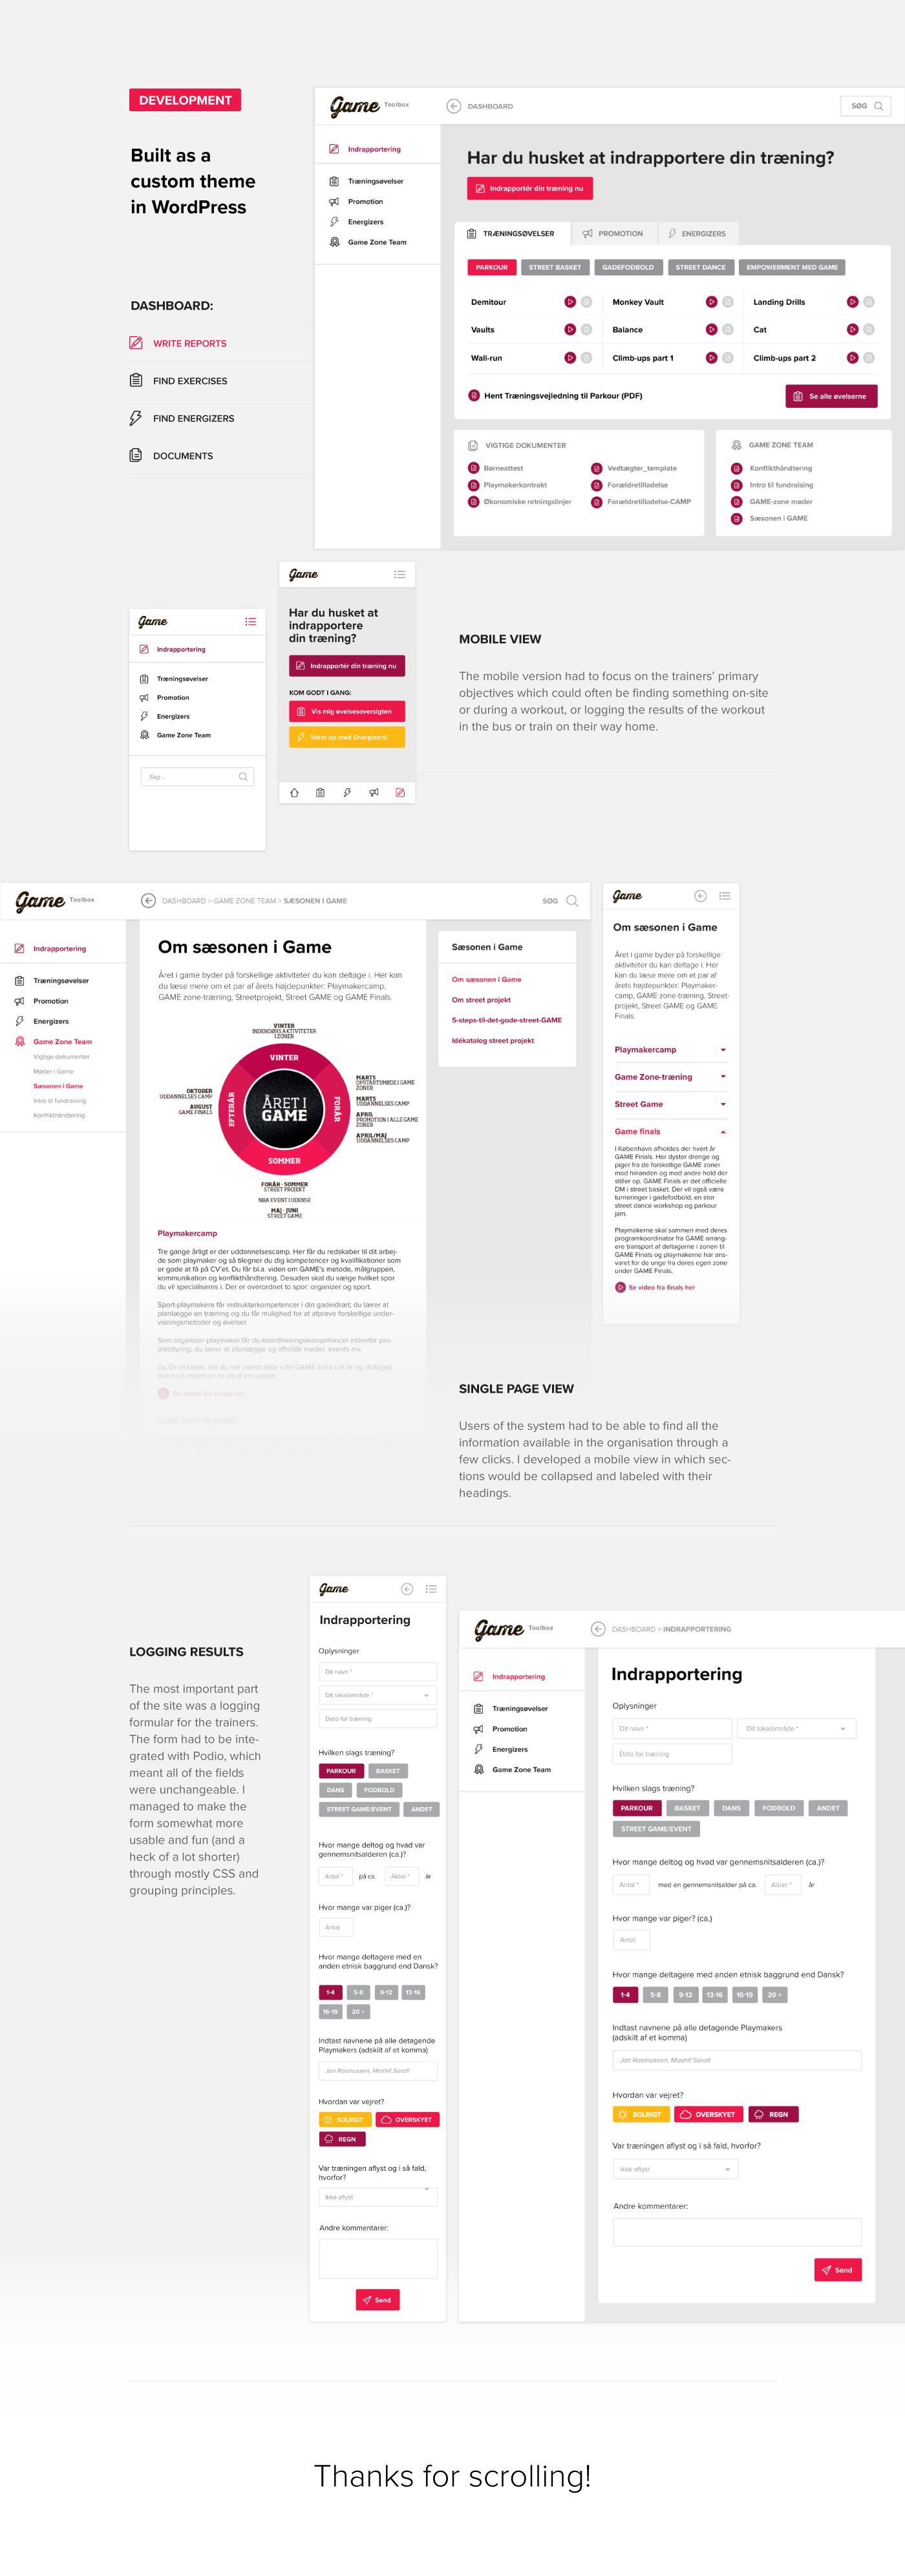 WordPress: A custom WP theme for Game Denmark